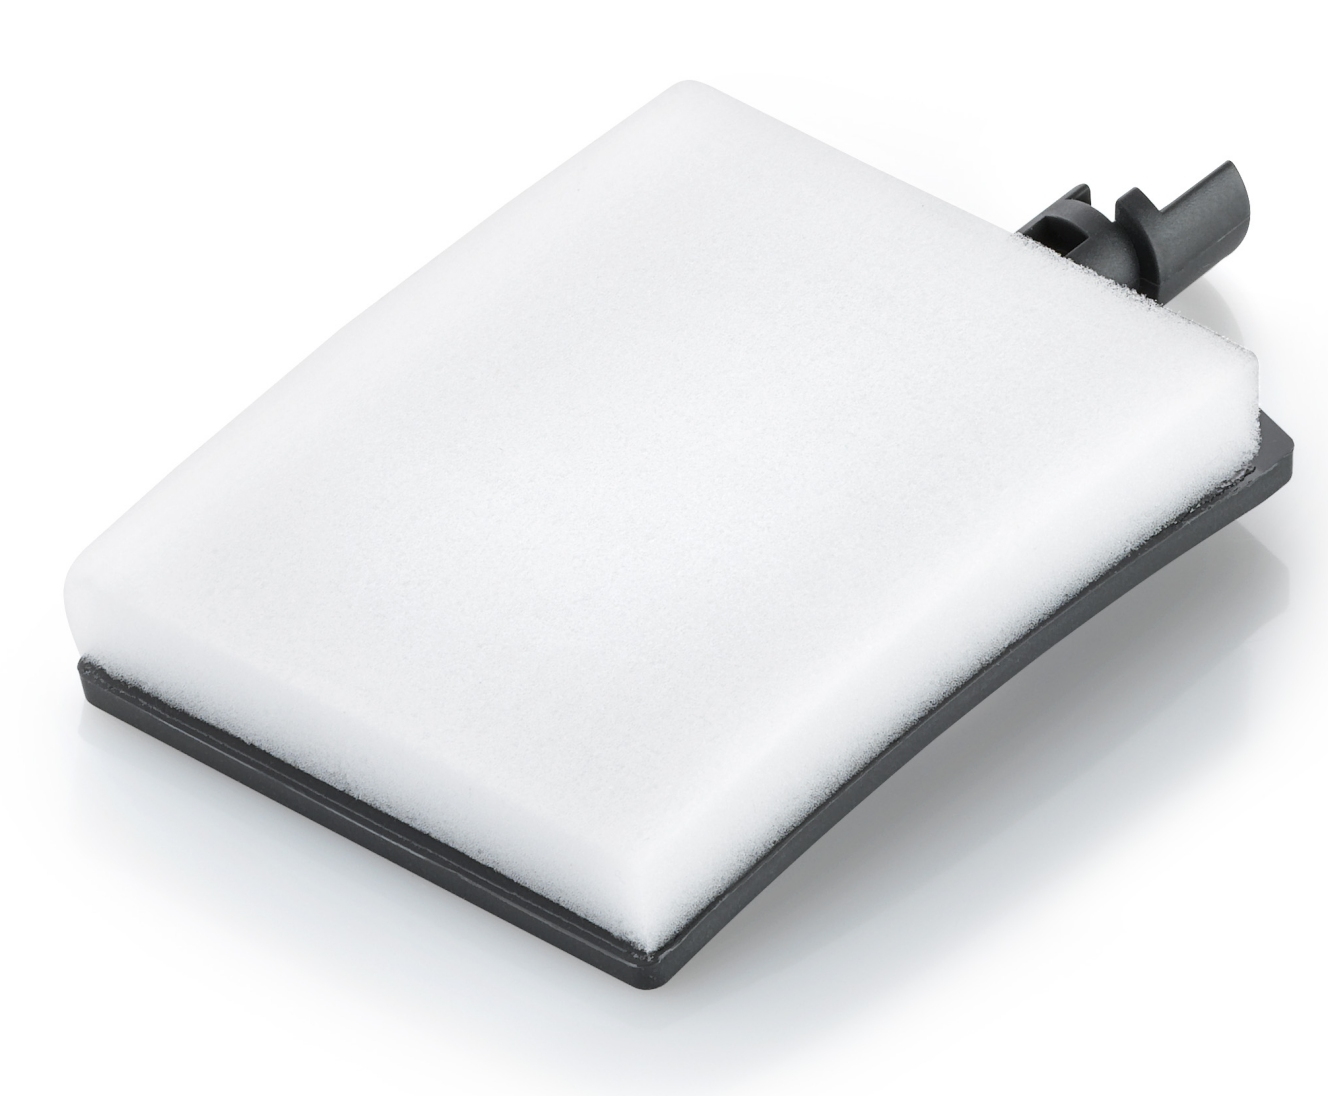 EHEIM rapid Cleaner - Cleaning Sponge